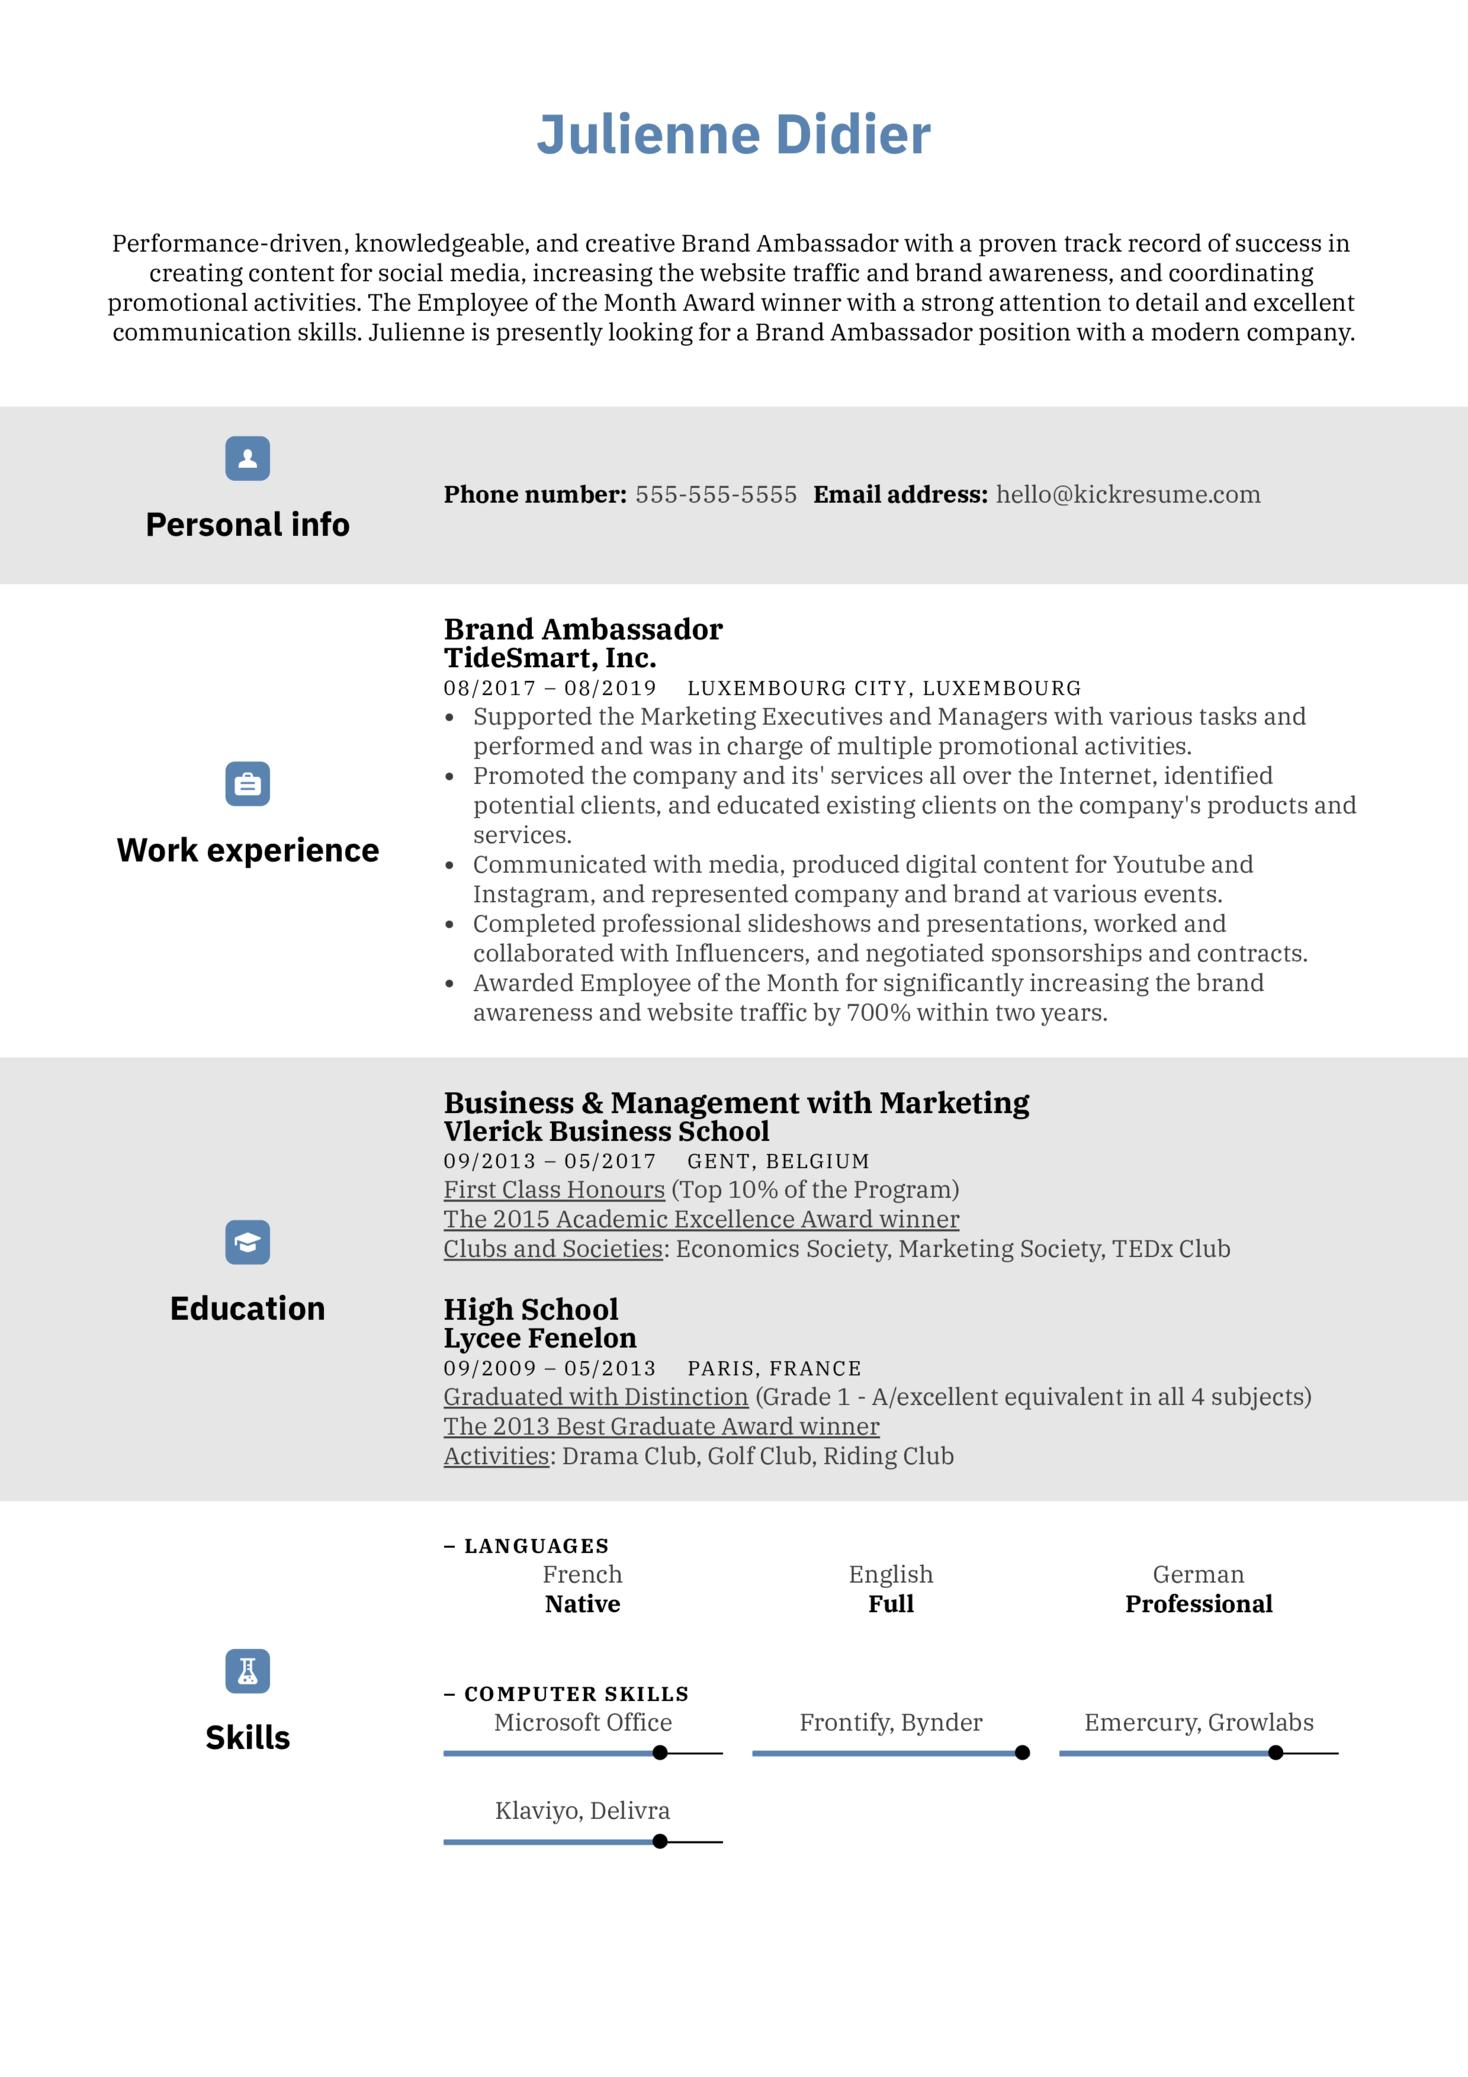 Brand Ambassador Resume Example (Part 1)